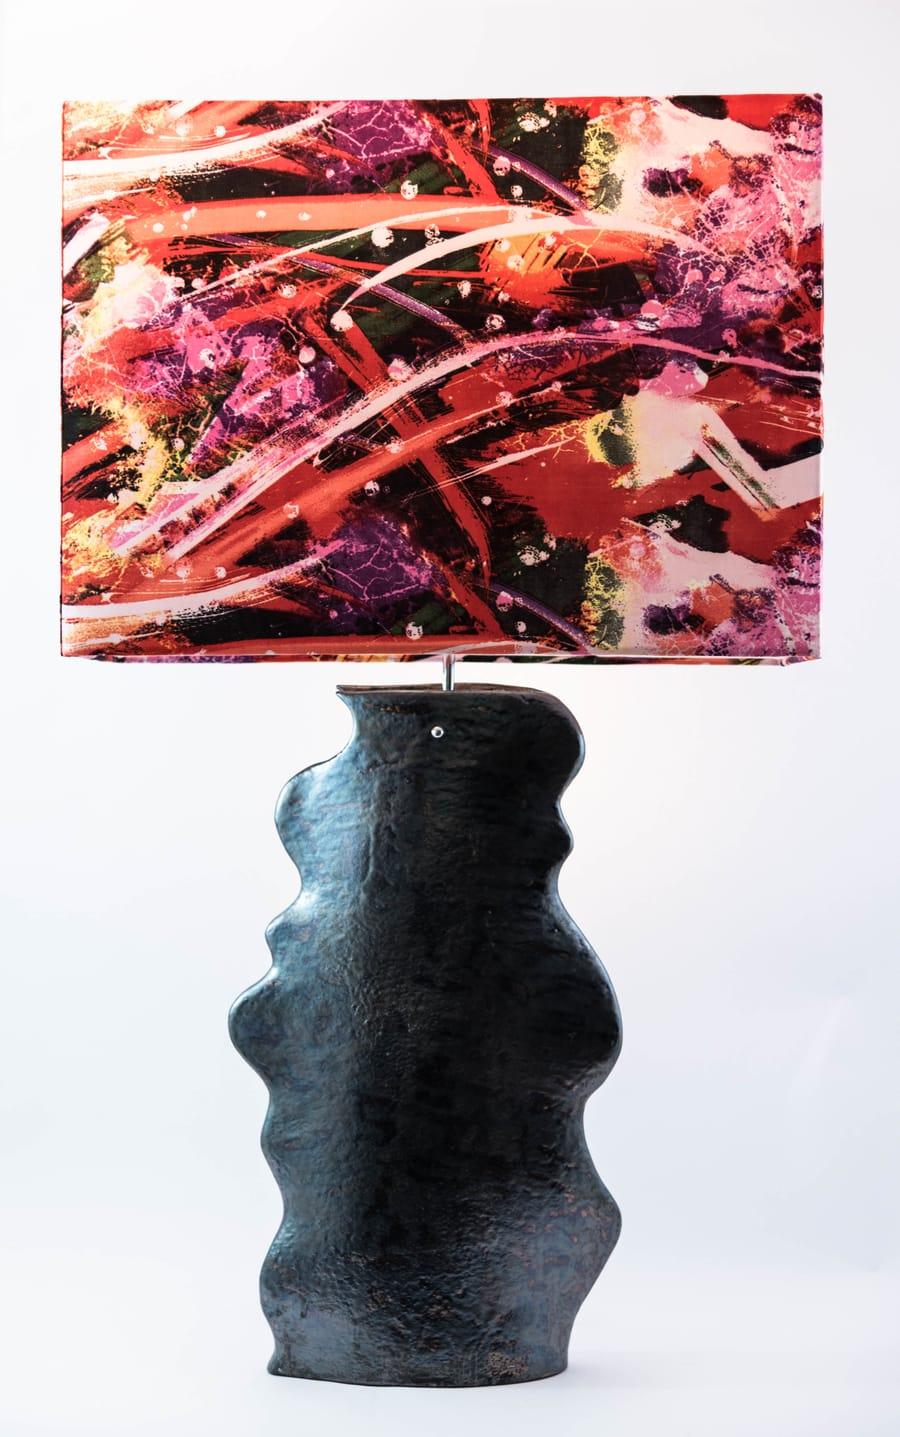 Lampada colorata con base in ceramica nera asimmetrica